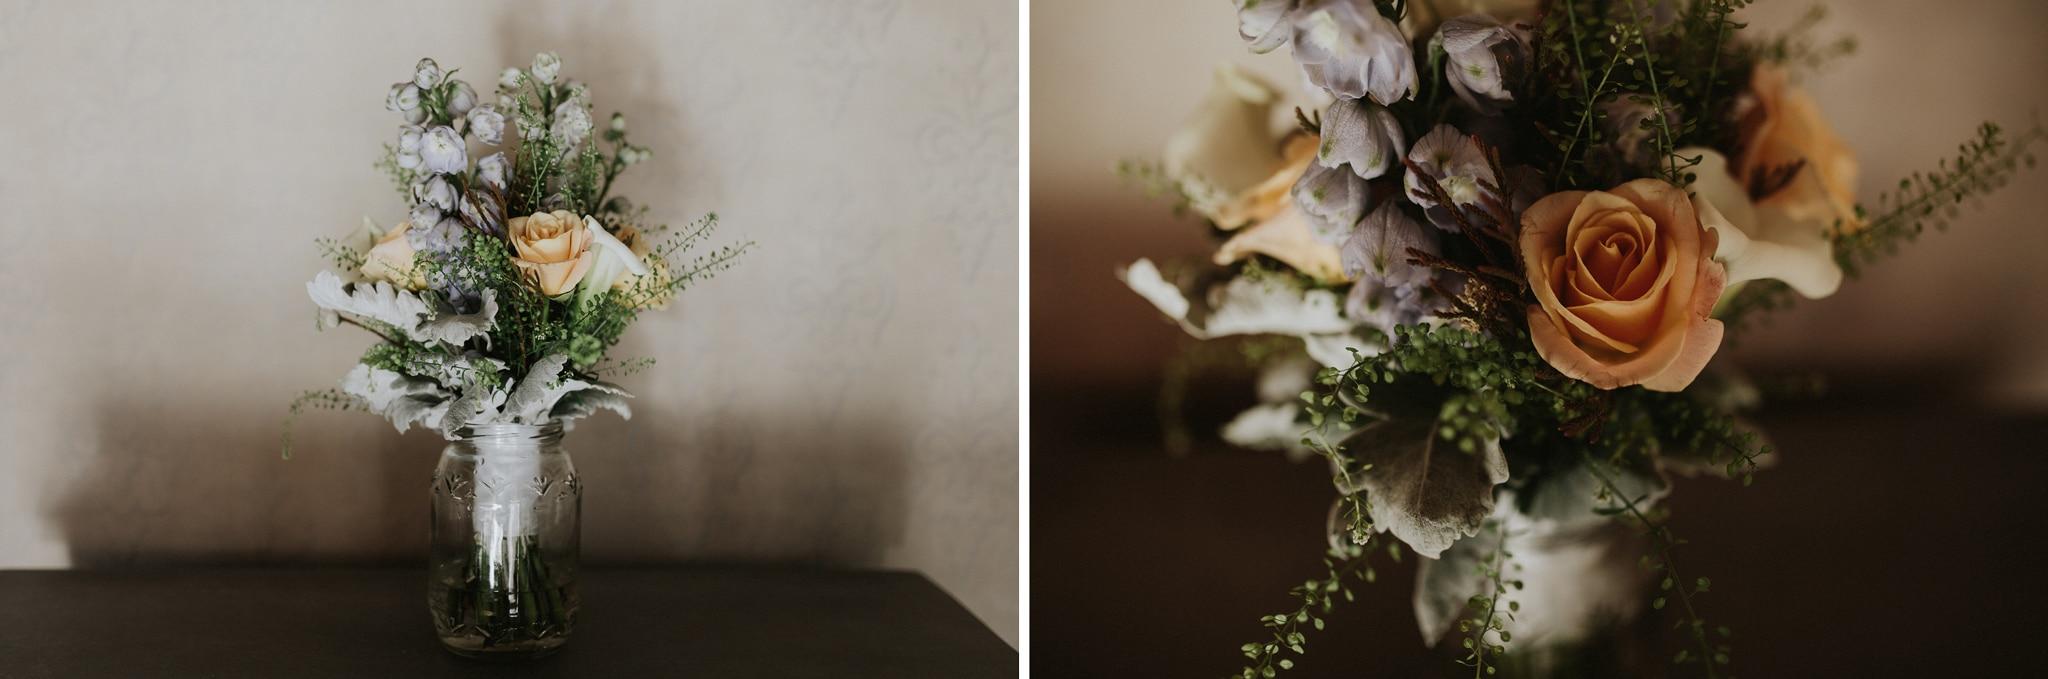 Fotografo-bodas-Cigarral-de-las-Mercedes-16